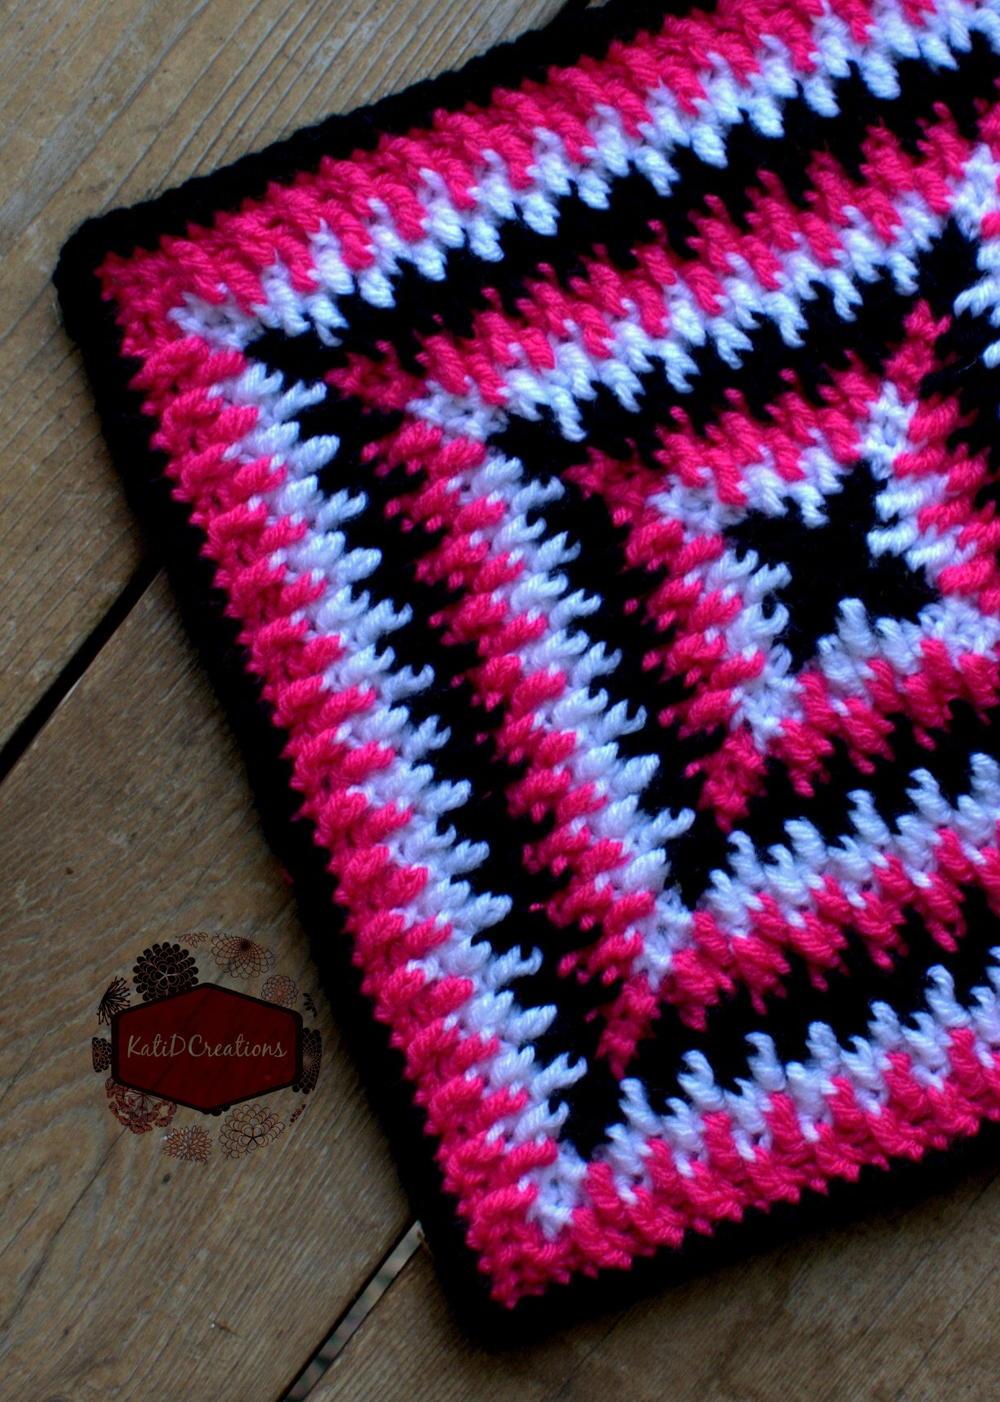 Mosaic Crochet Afghan Pattern : Mosaic Ripples Granny Square AllFreeCrochet.com